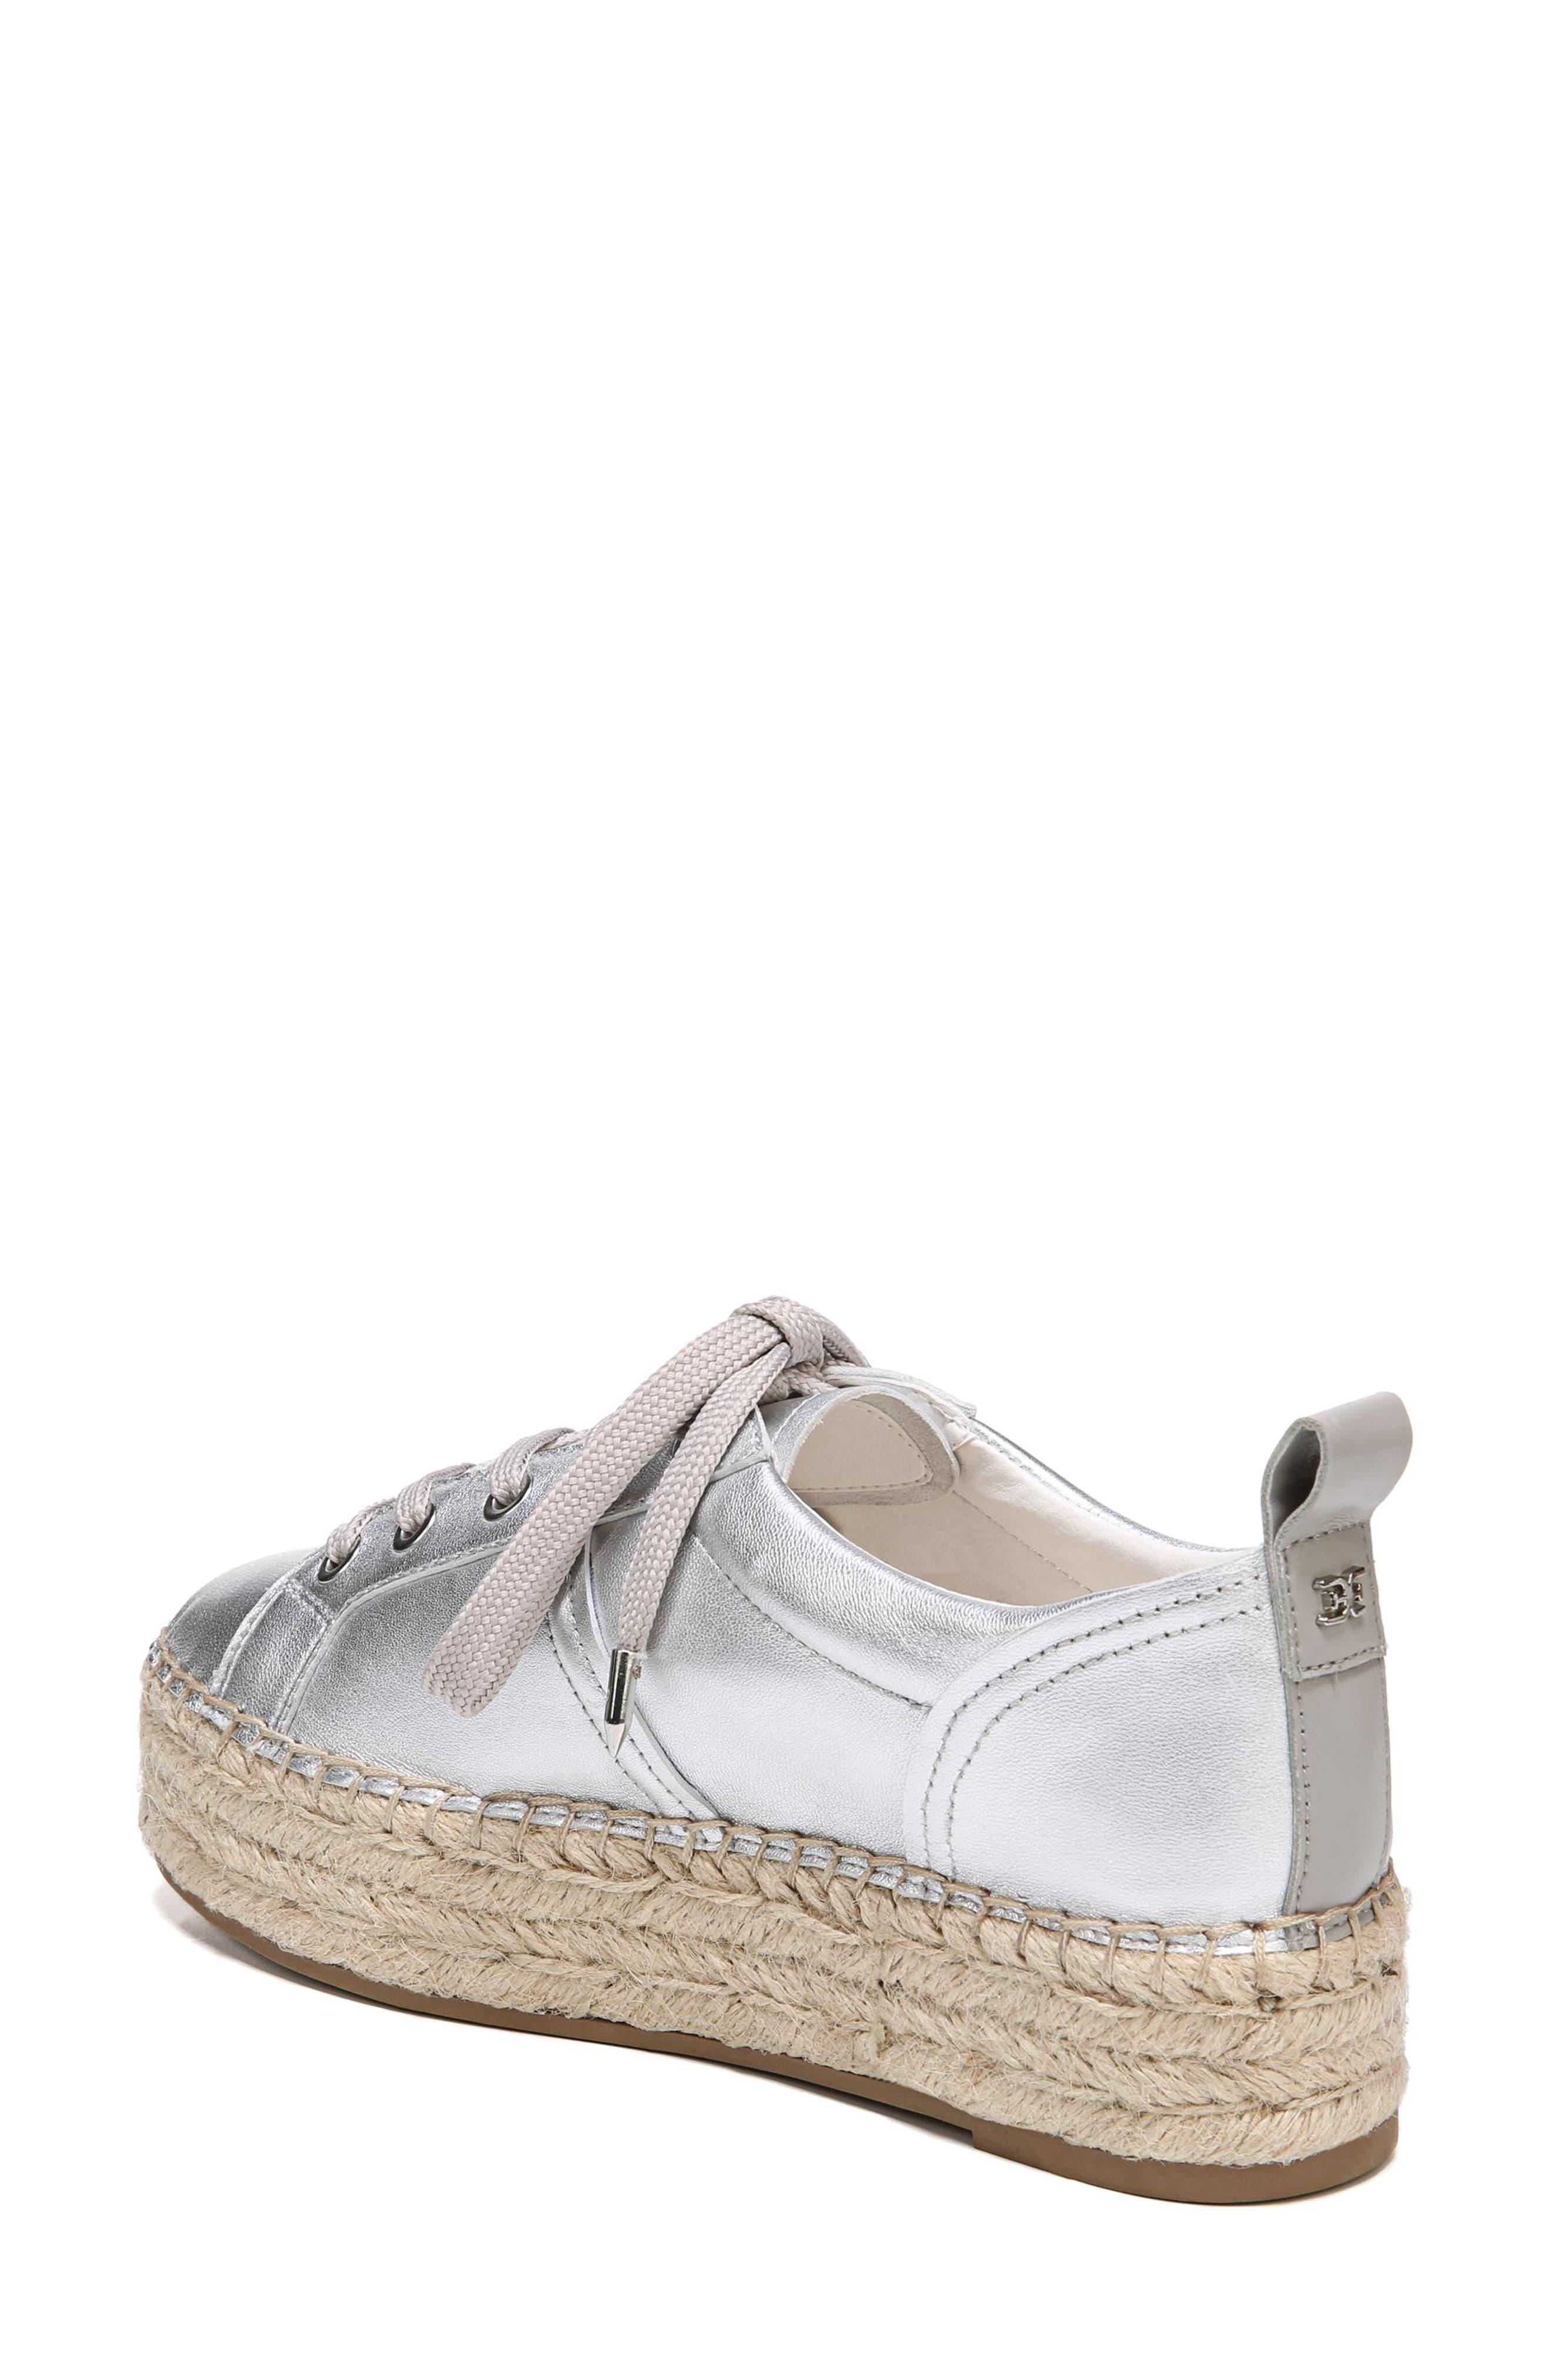 Carleigh Espadrille Sneaker,                             Alternate thumbnail 2, color,                             040